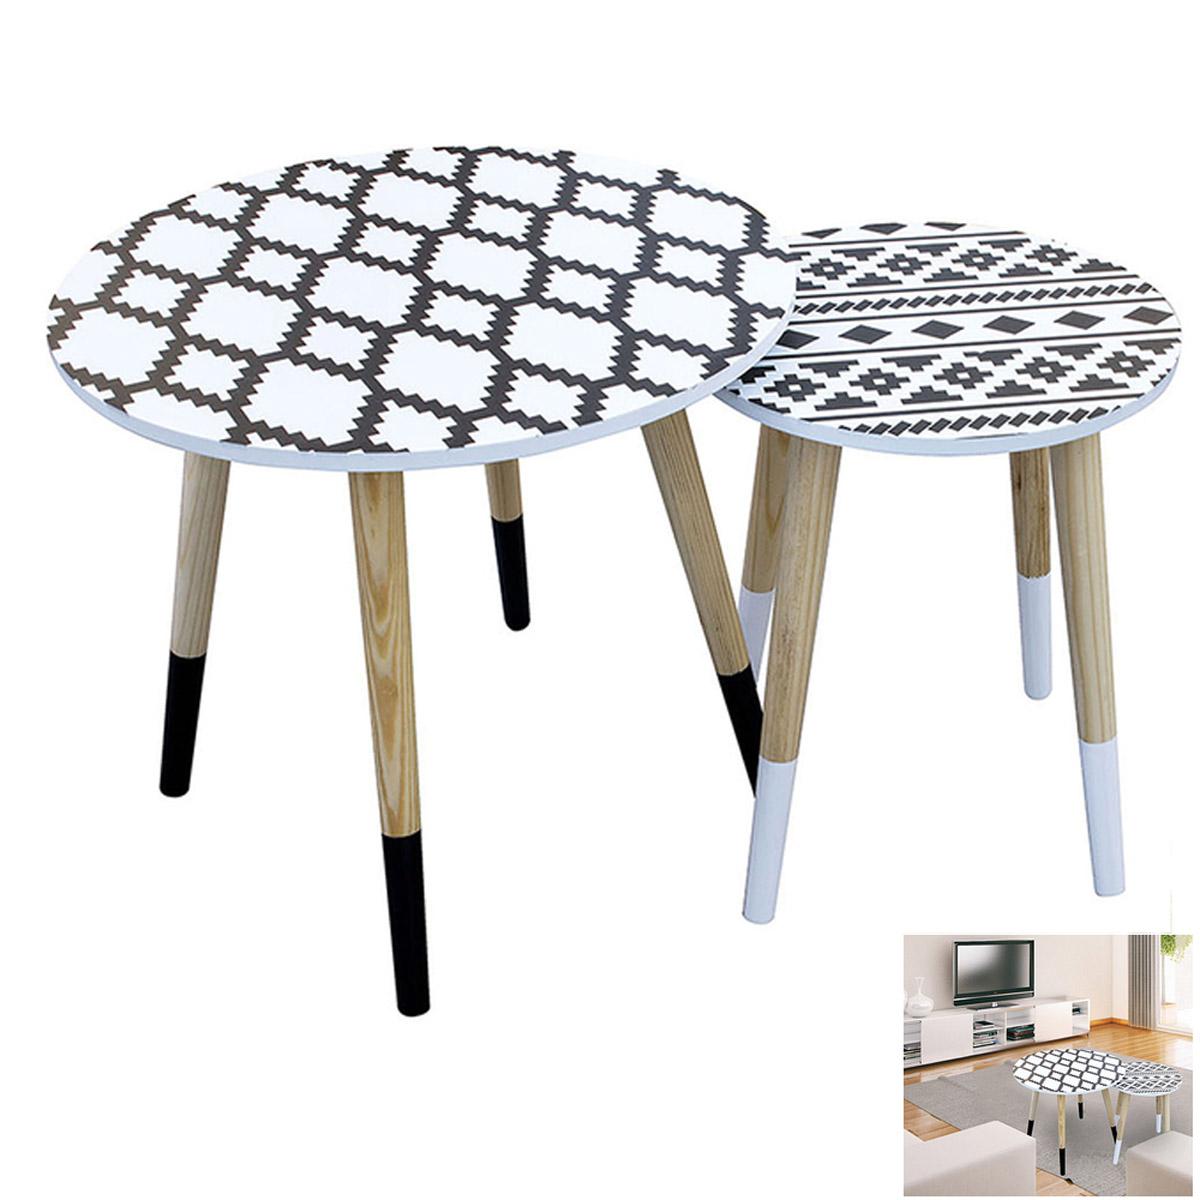 2 tables gigognes bois \'Boho\' noir blanc - 48 et 33 cm - [R2396]